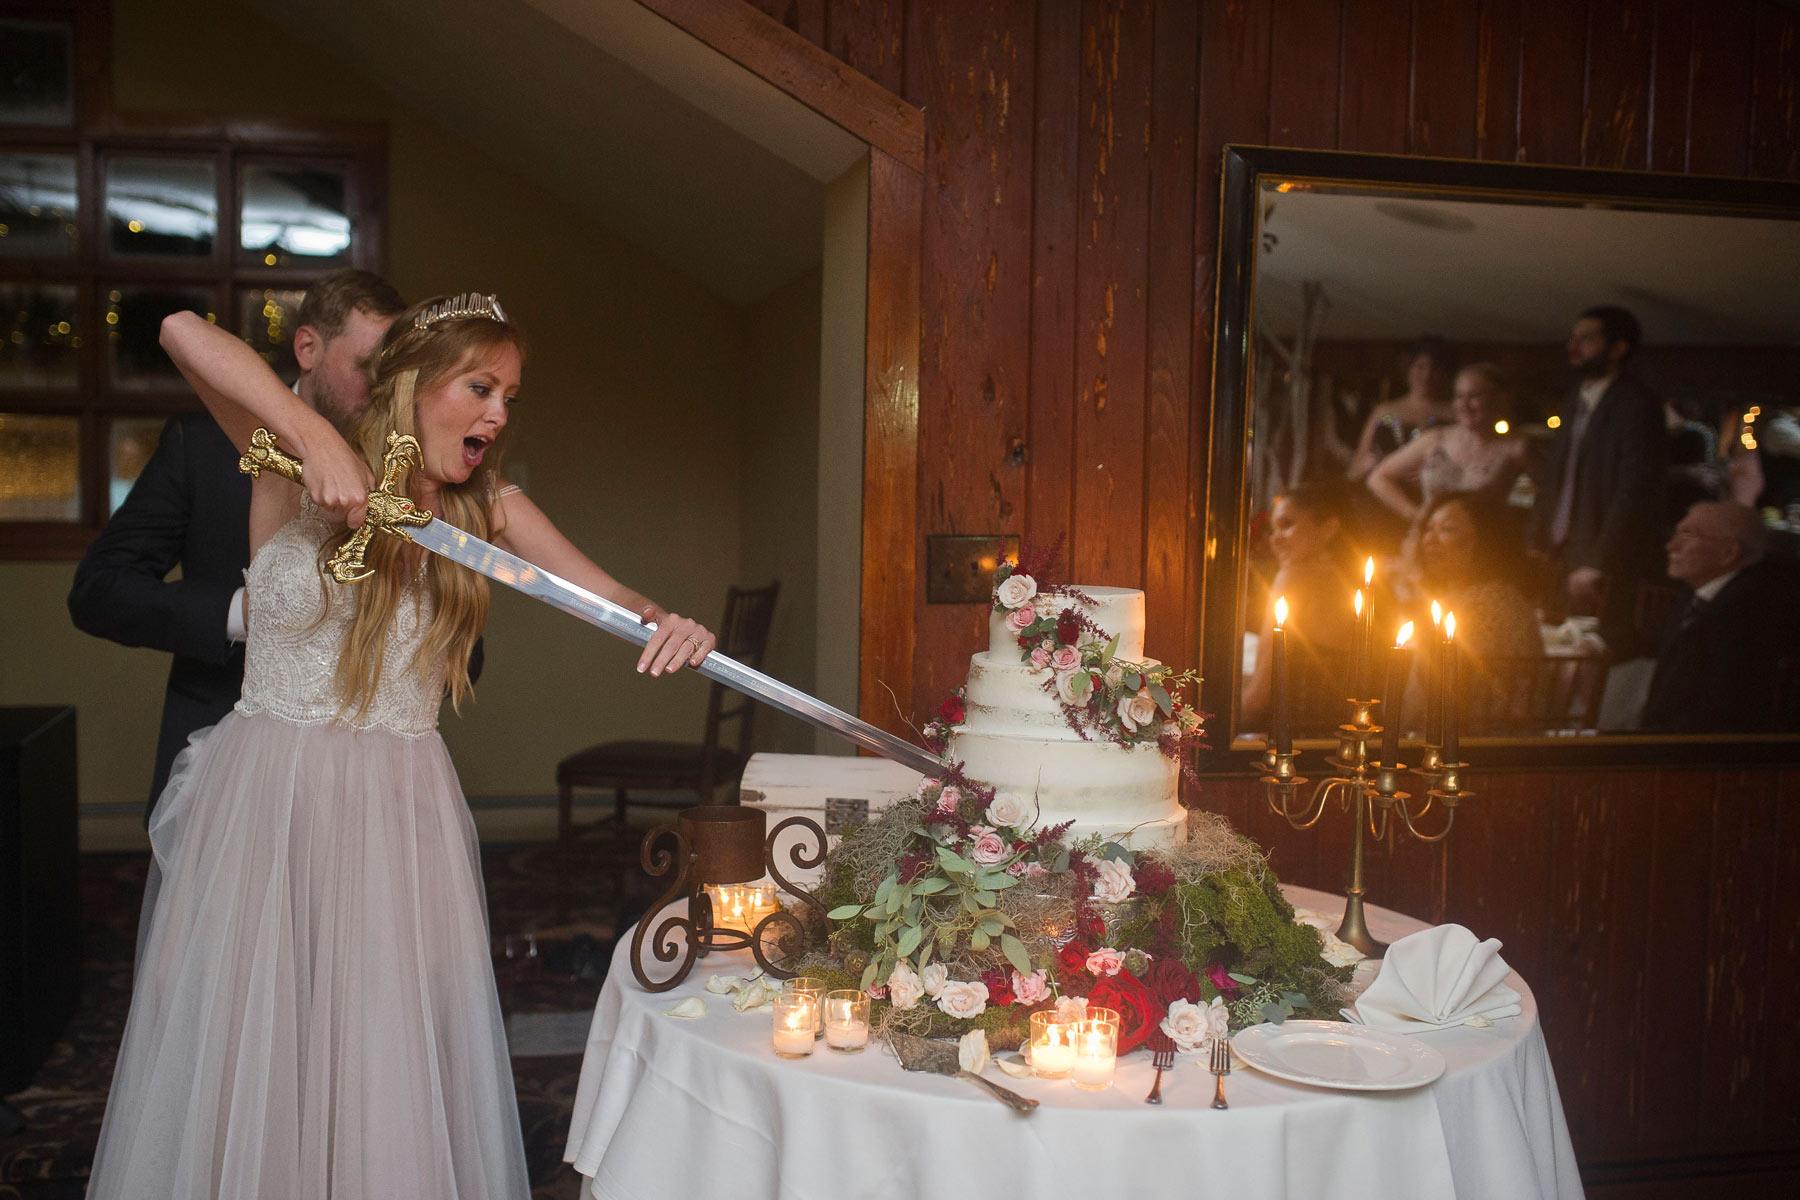 Bucks_County_wedding_photographer_Stroudsmoor_country_inn_wedding_Philadelphia_wedding_photographer_31_sword_cake_cutting_game_of_thrones_wedding.JPG